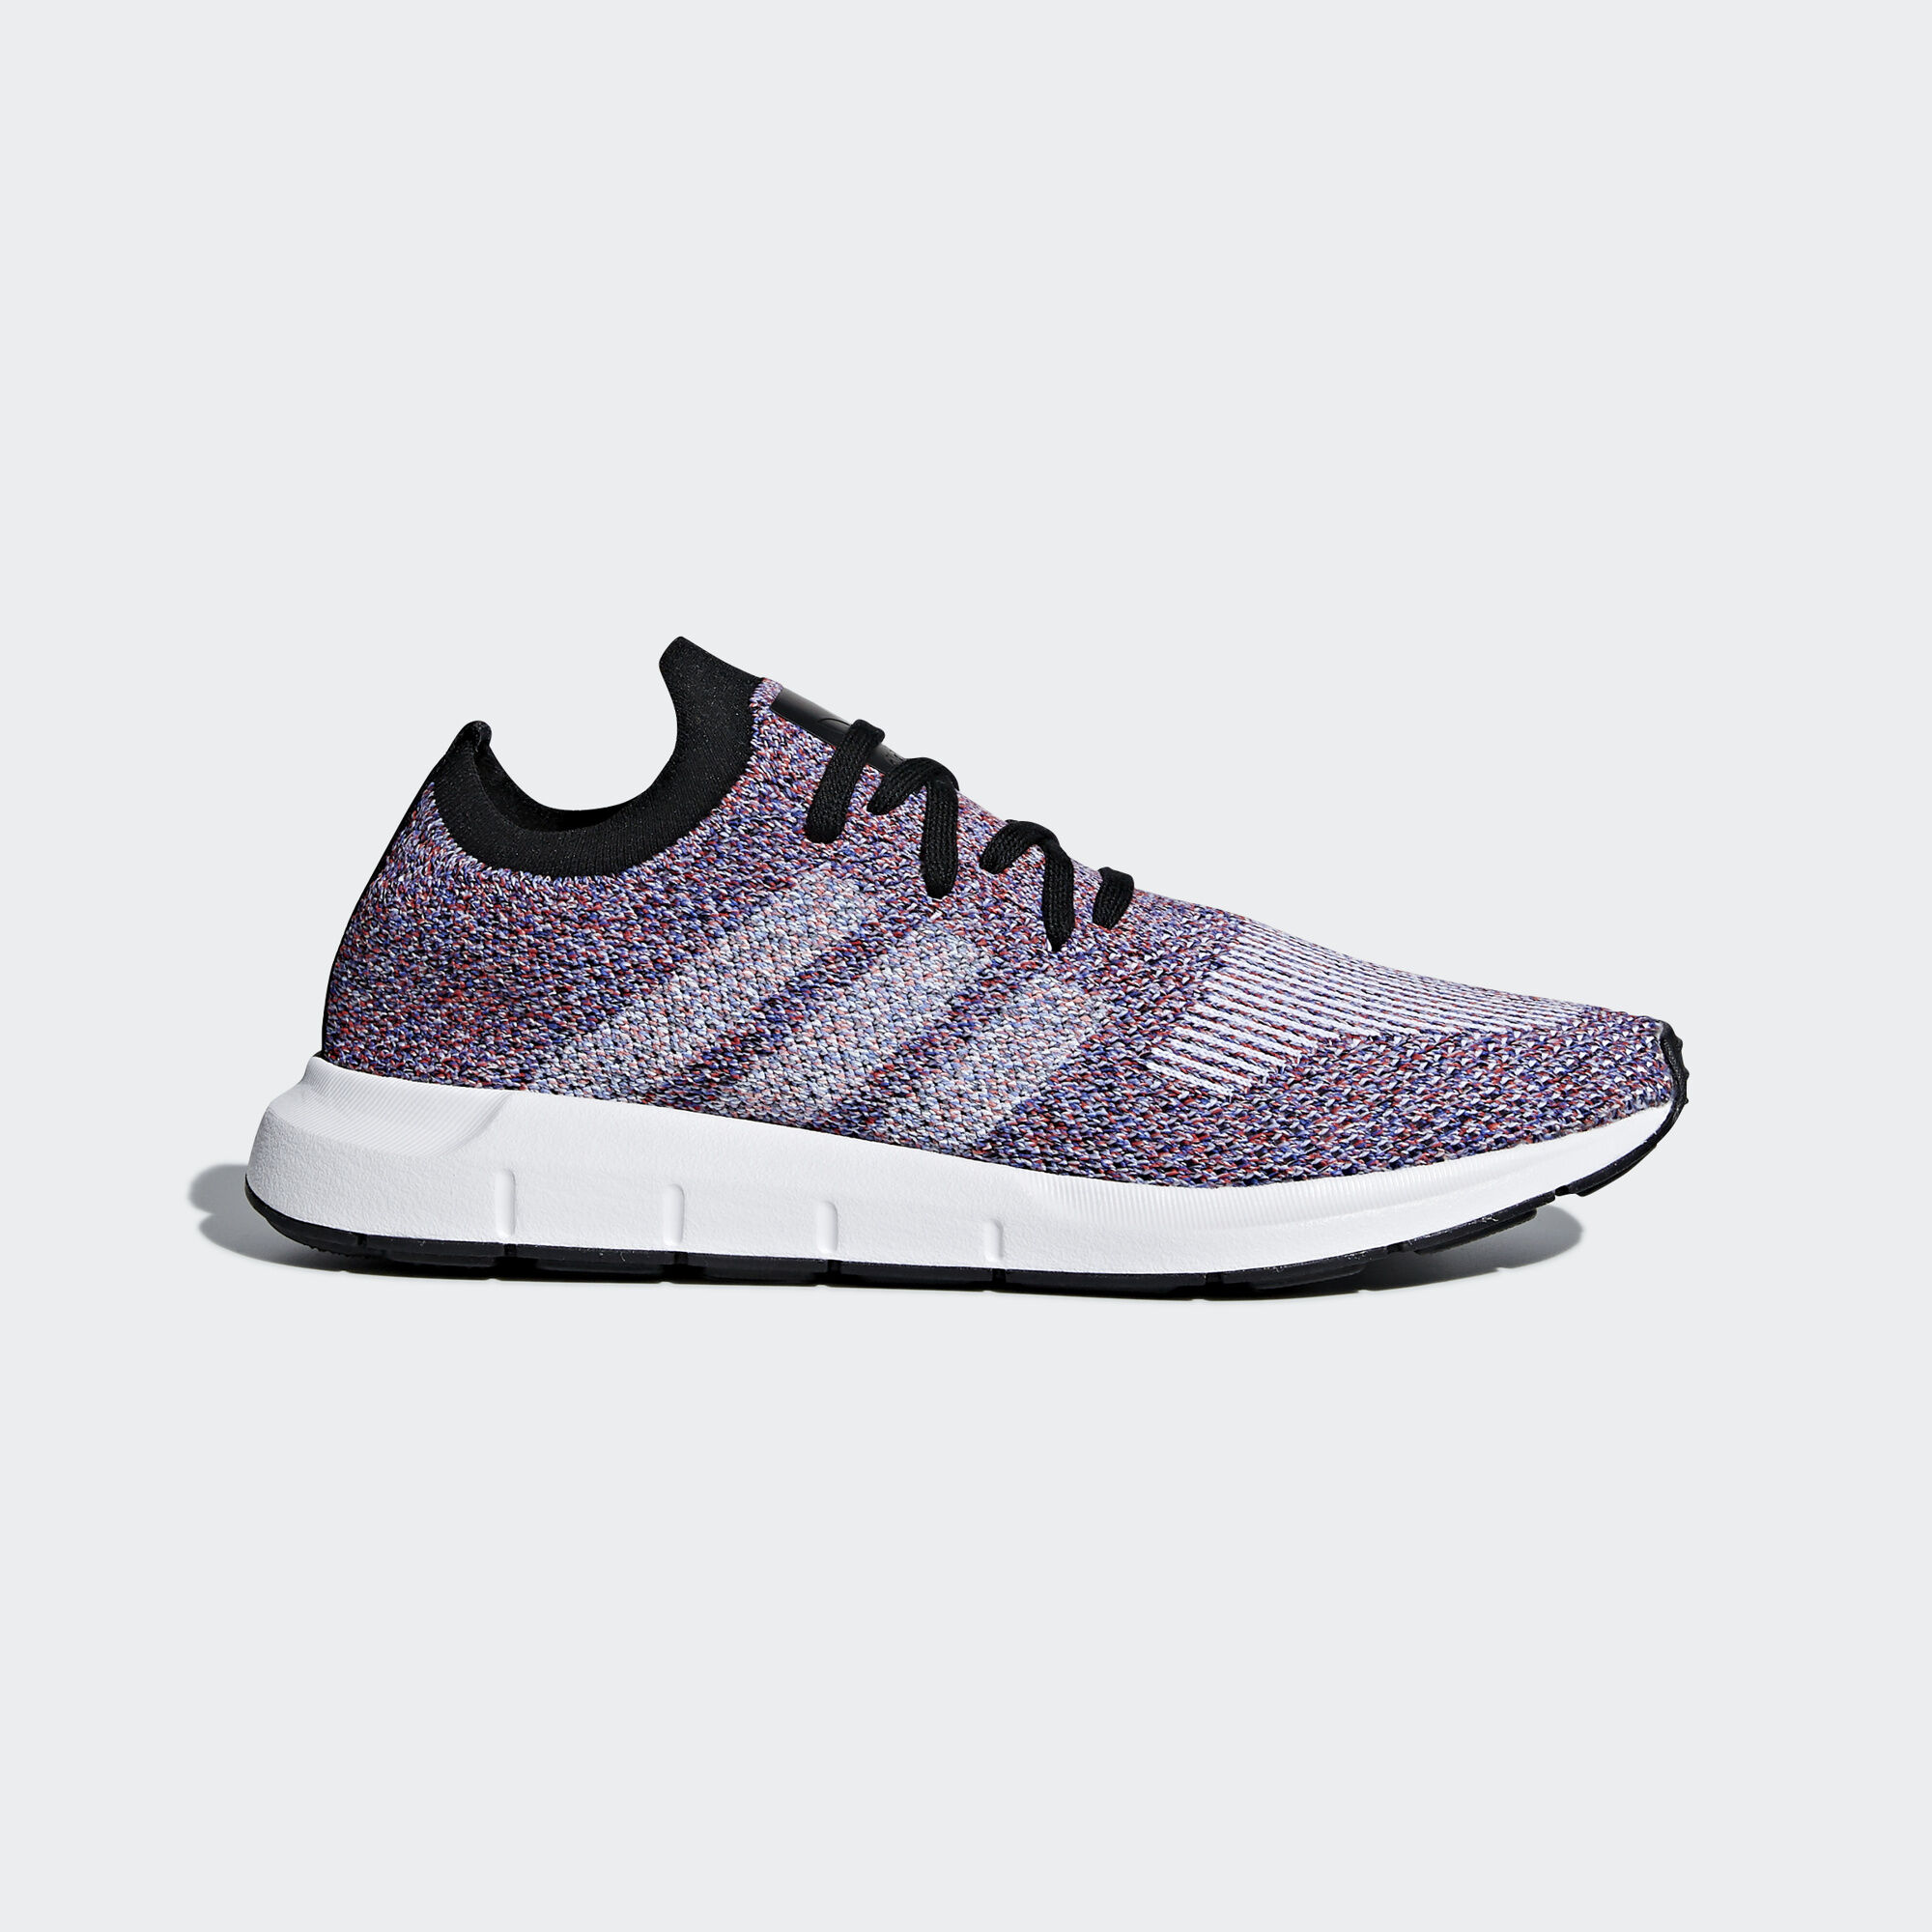 Adidas swift run primeknit scarpe viola adidas regionali